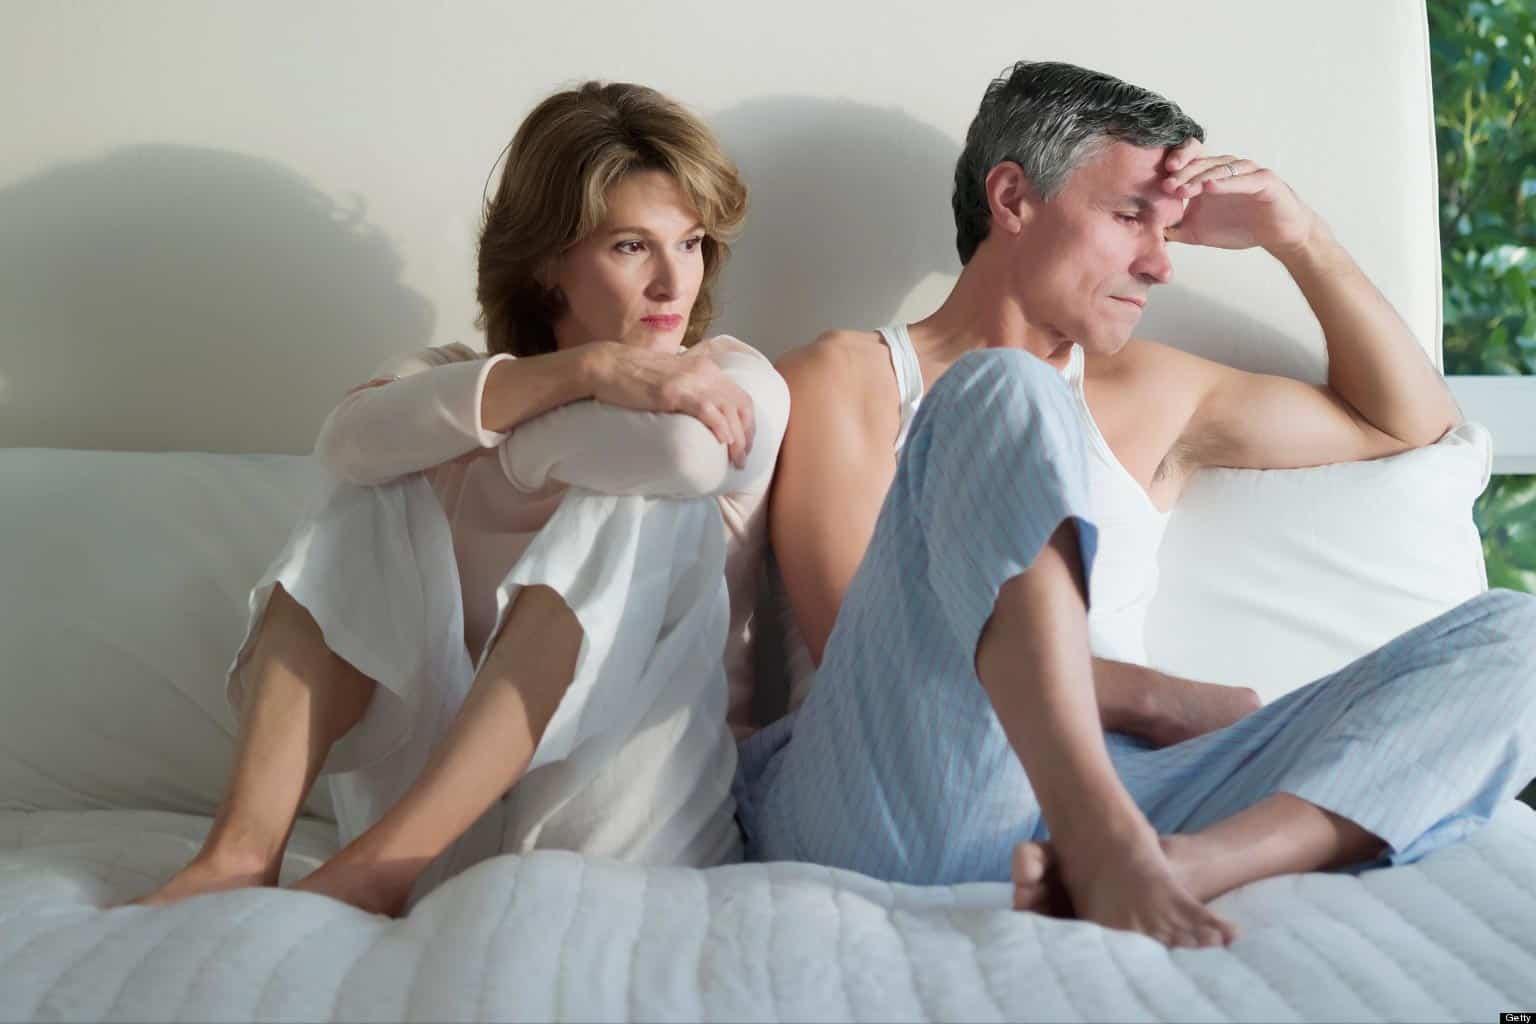 rastava, braka, razvod, DIVORCE, romansa, net